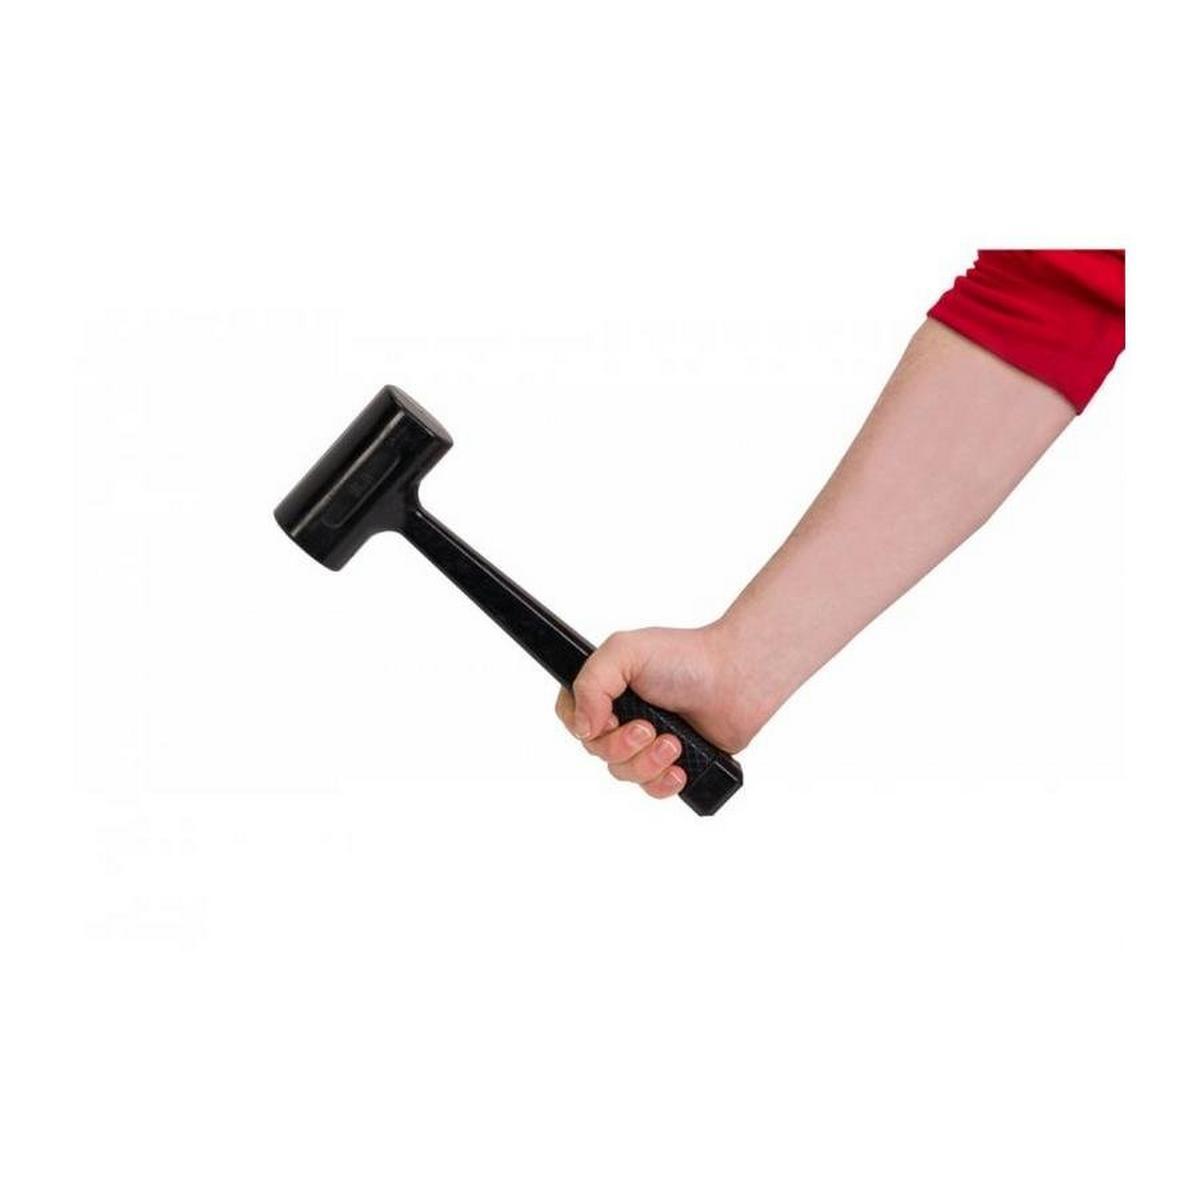 Vango Superstrike Hammer 2lb